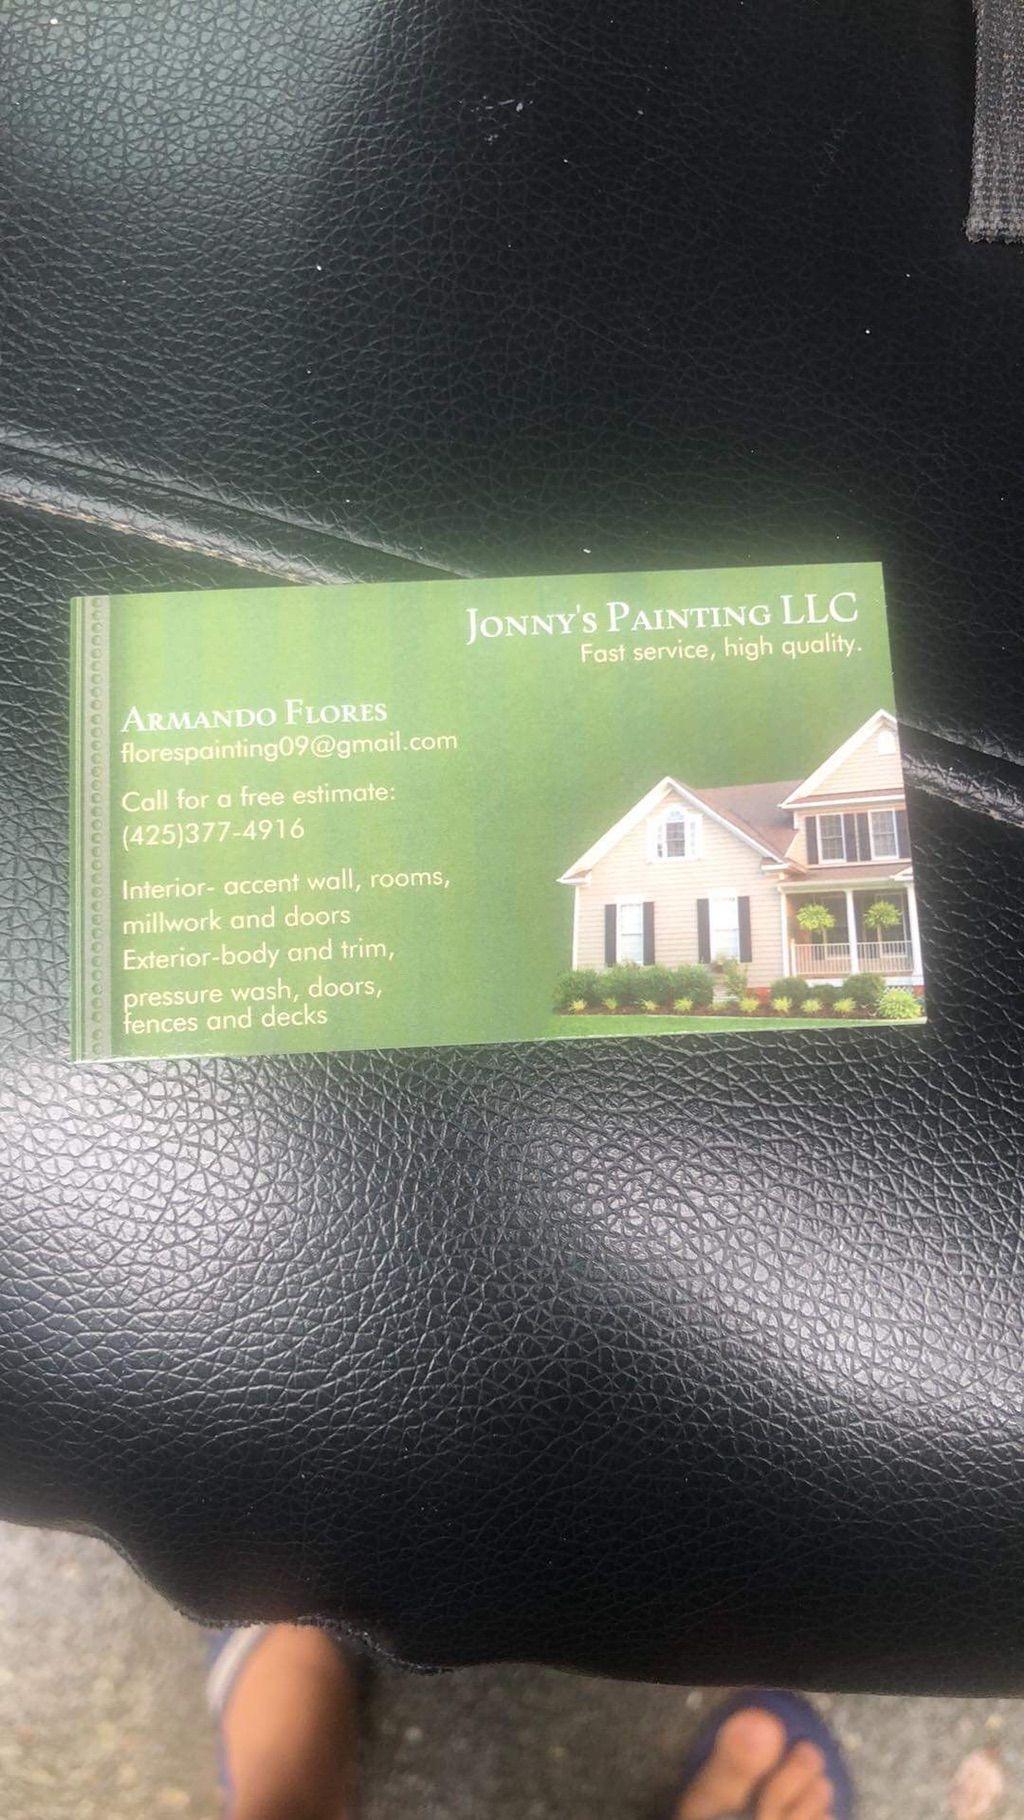 Jonny's Painting LLC